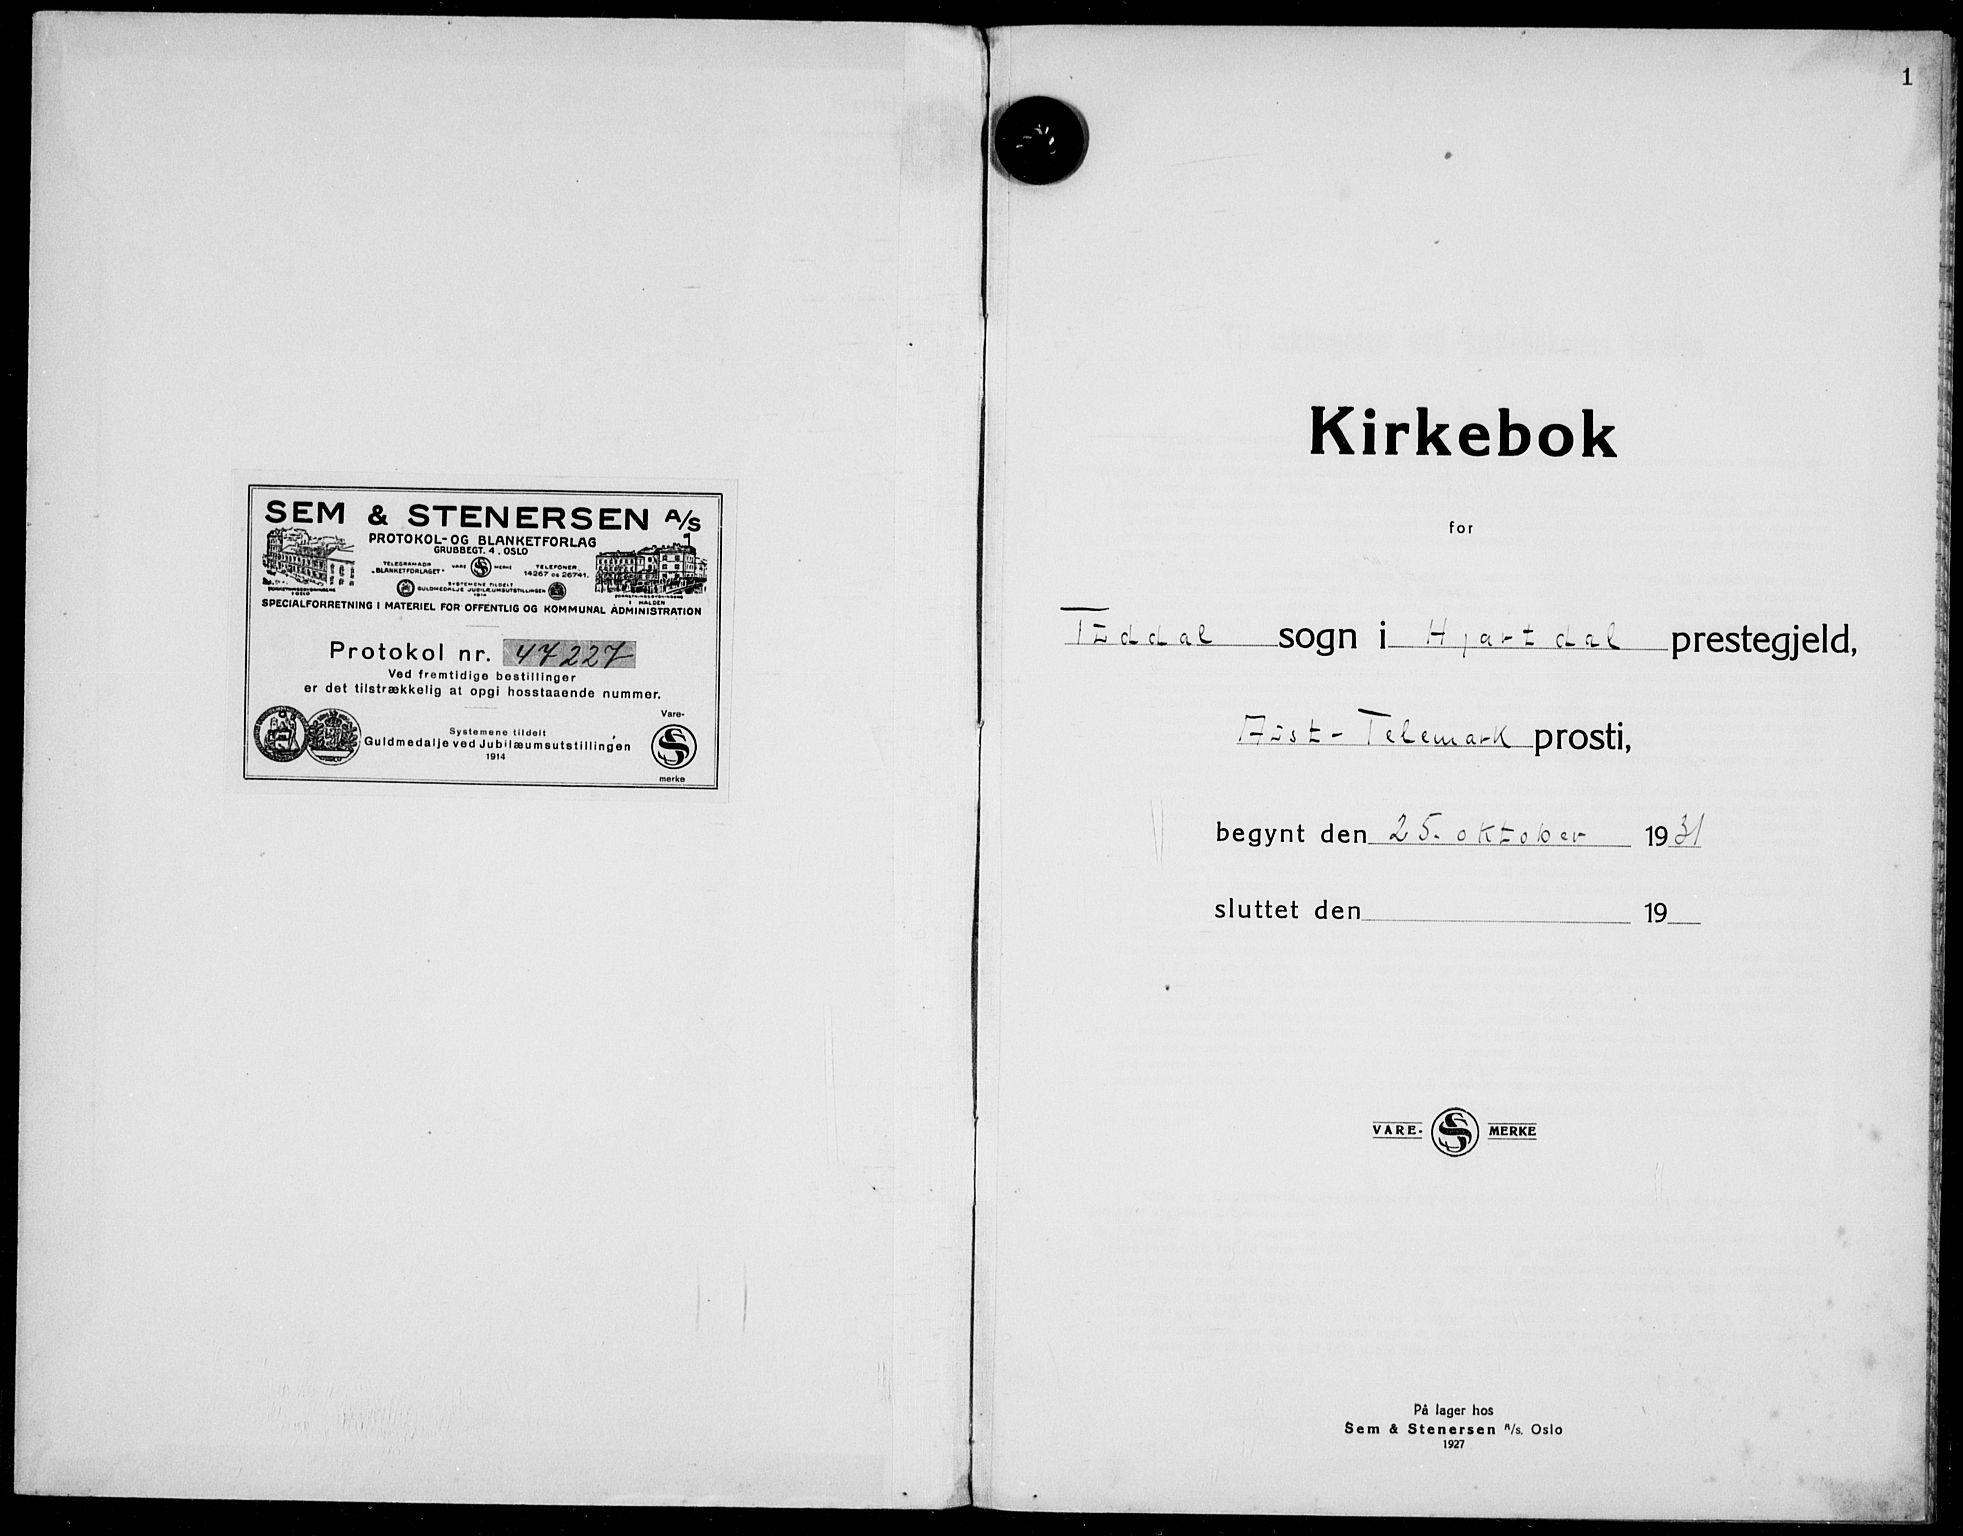 SAKO, Hjartdal kirkebøker, F/Fc/L0003: Ministerialbok nr. III 3, 1931-1936, s. 1